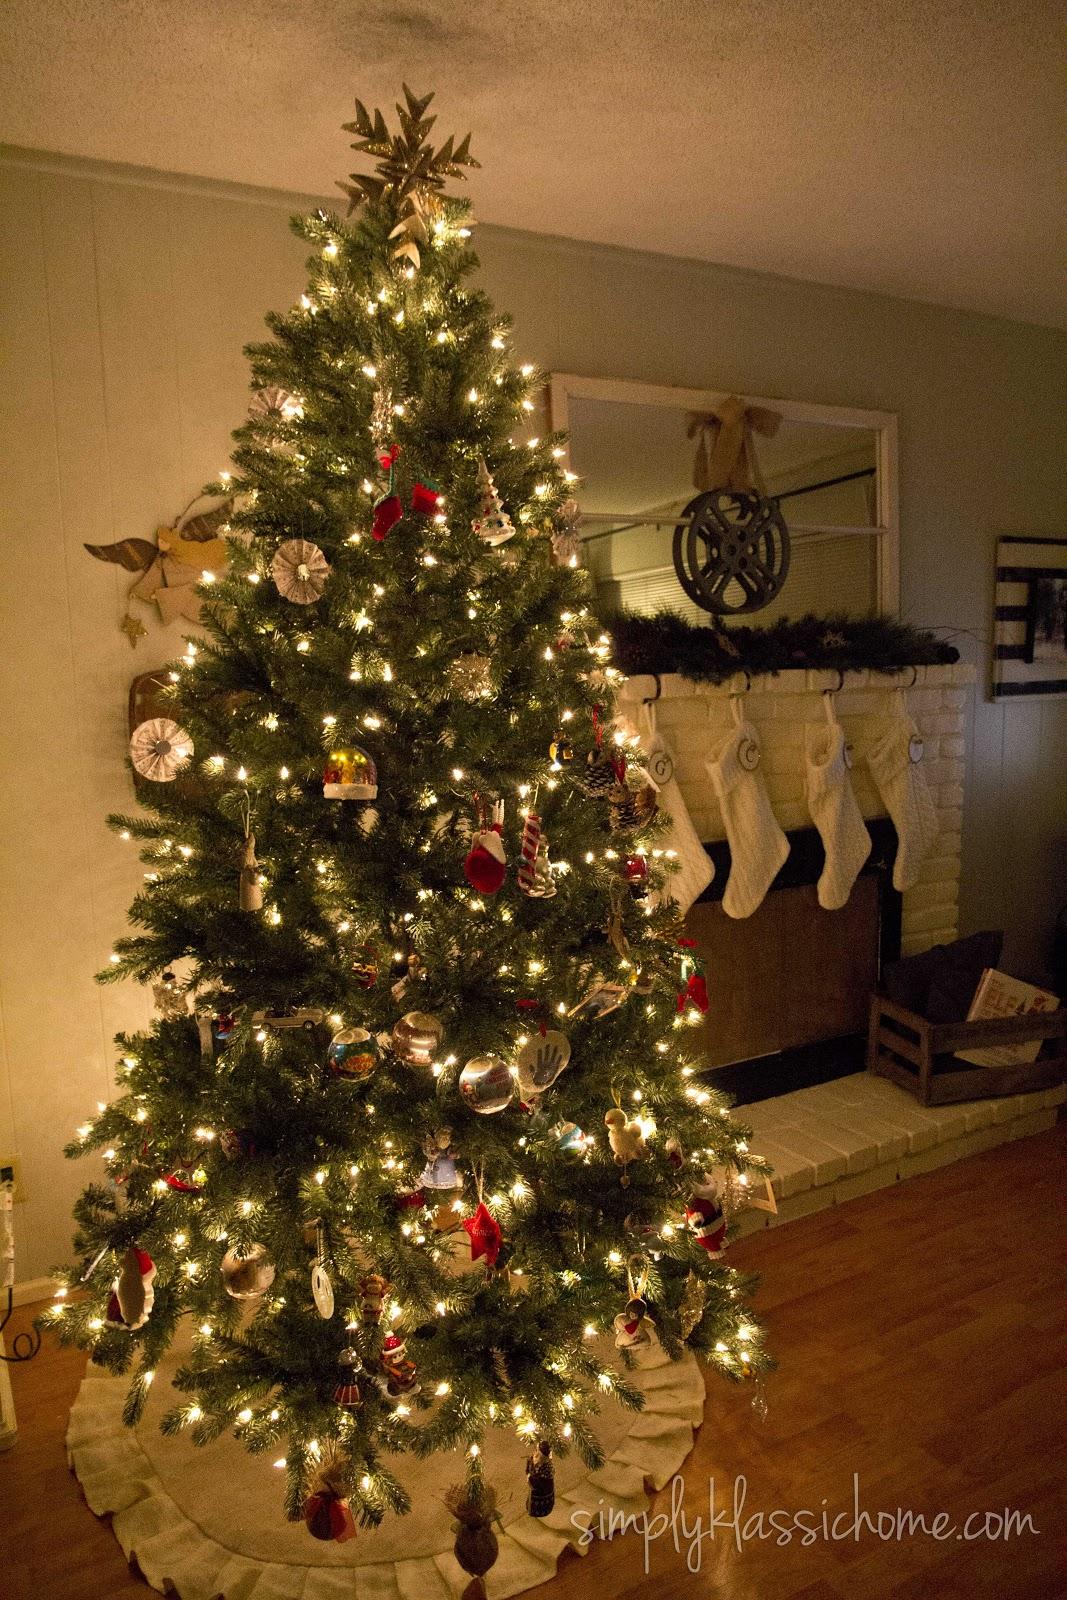 Pottery barn tree skirts - Christmas Mantel Tree Holiday 2012